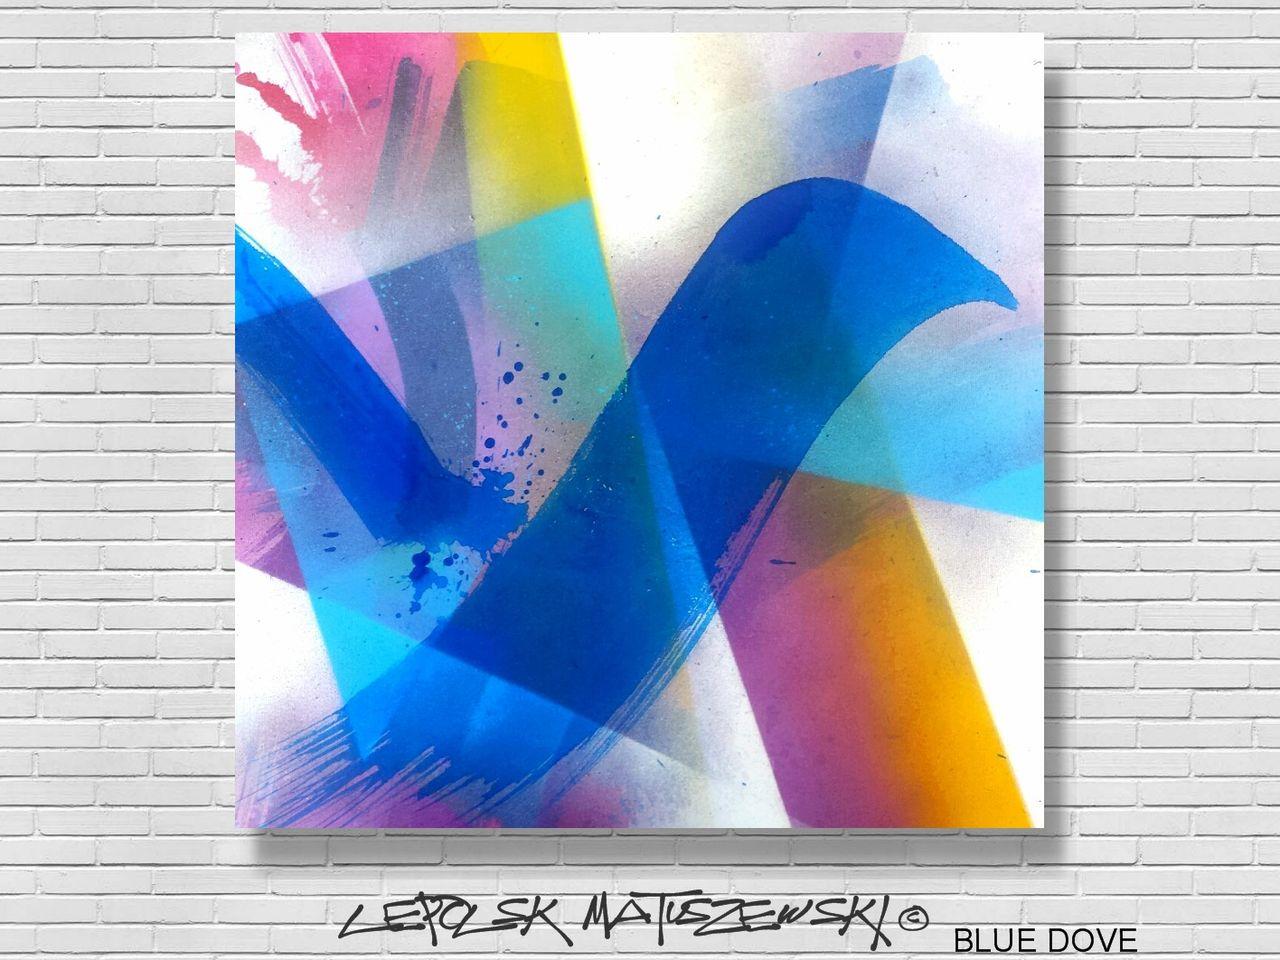 LEPOLSK MATUSZEWSKI BLUE DOVE abstract graffiti expressionism Lepolsk 2016